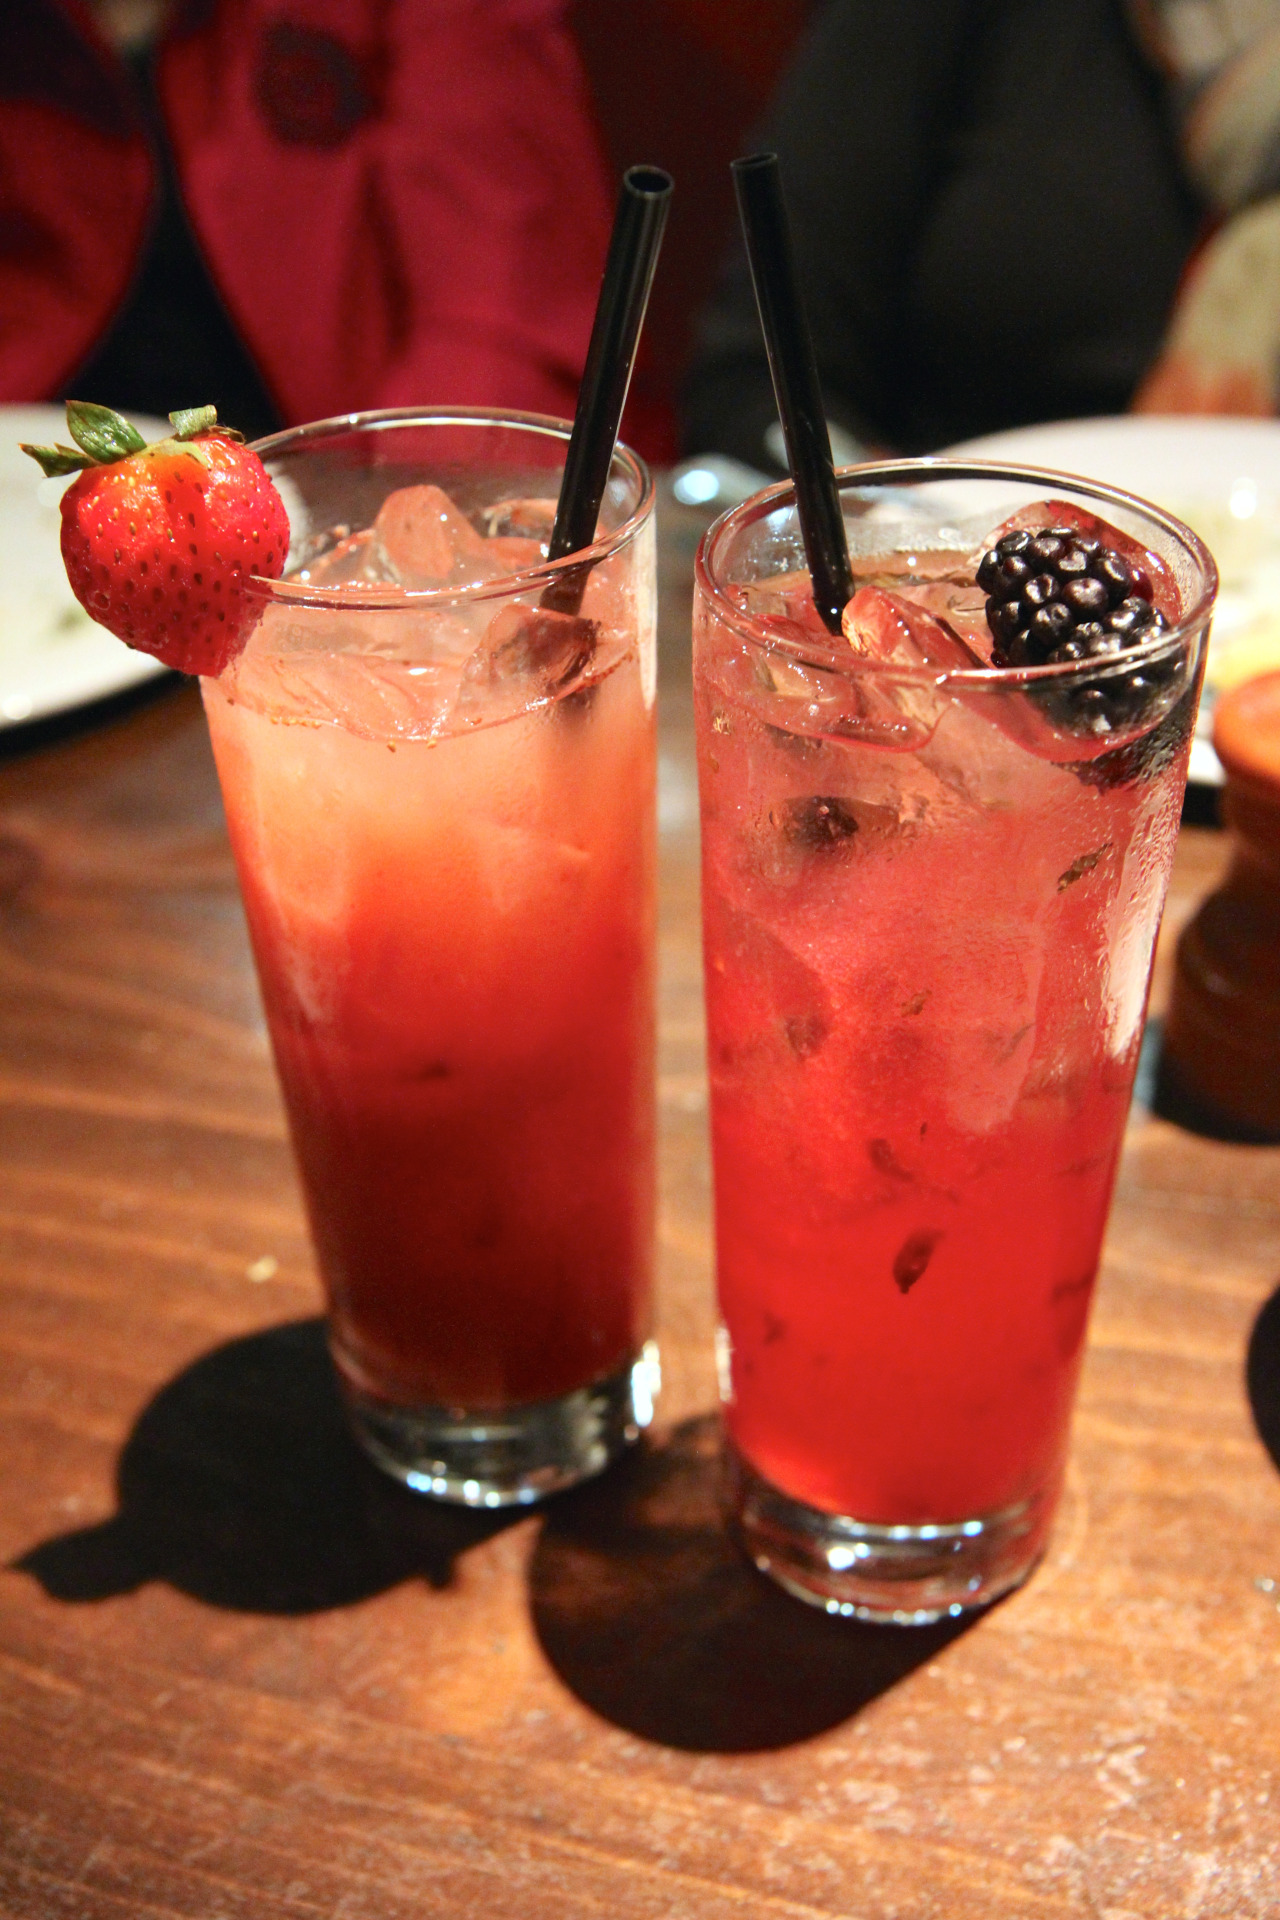 Watermelon & strawberry cooler (left); Blackberry & lychee lemonade (right)